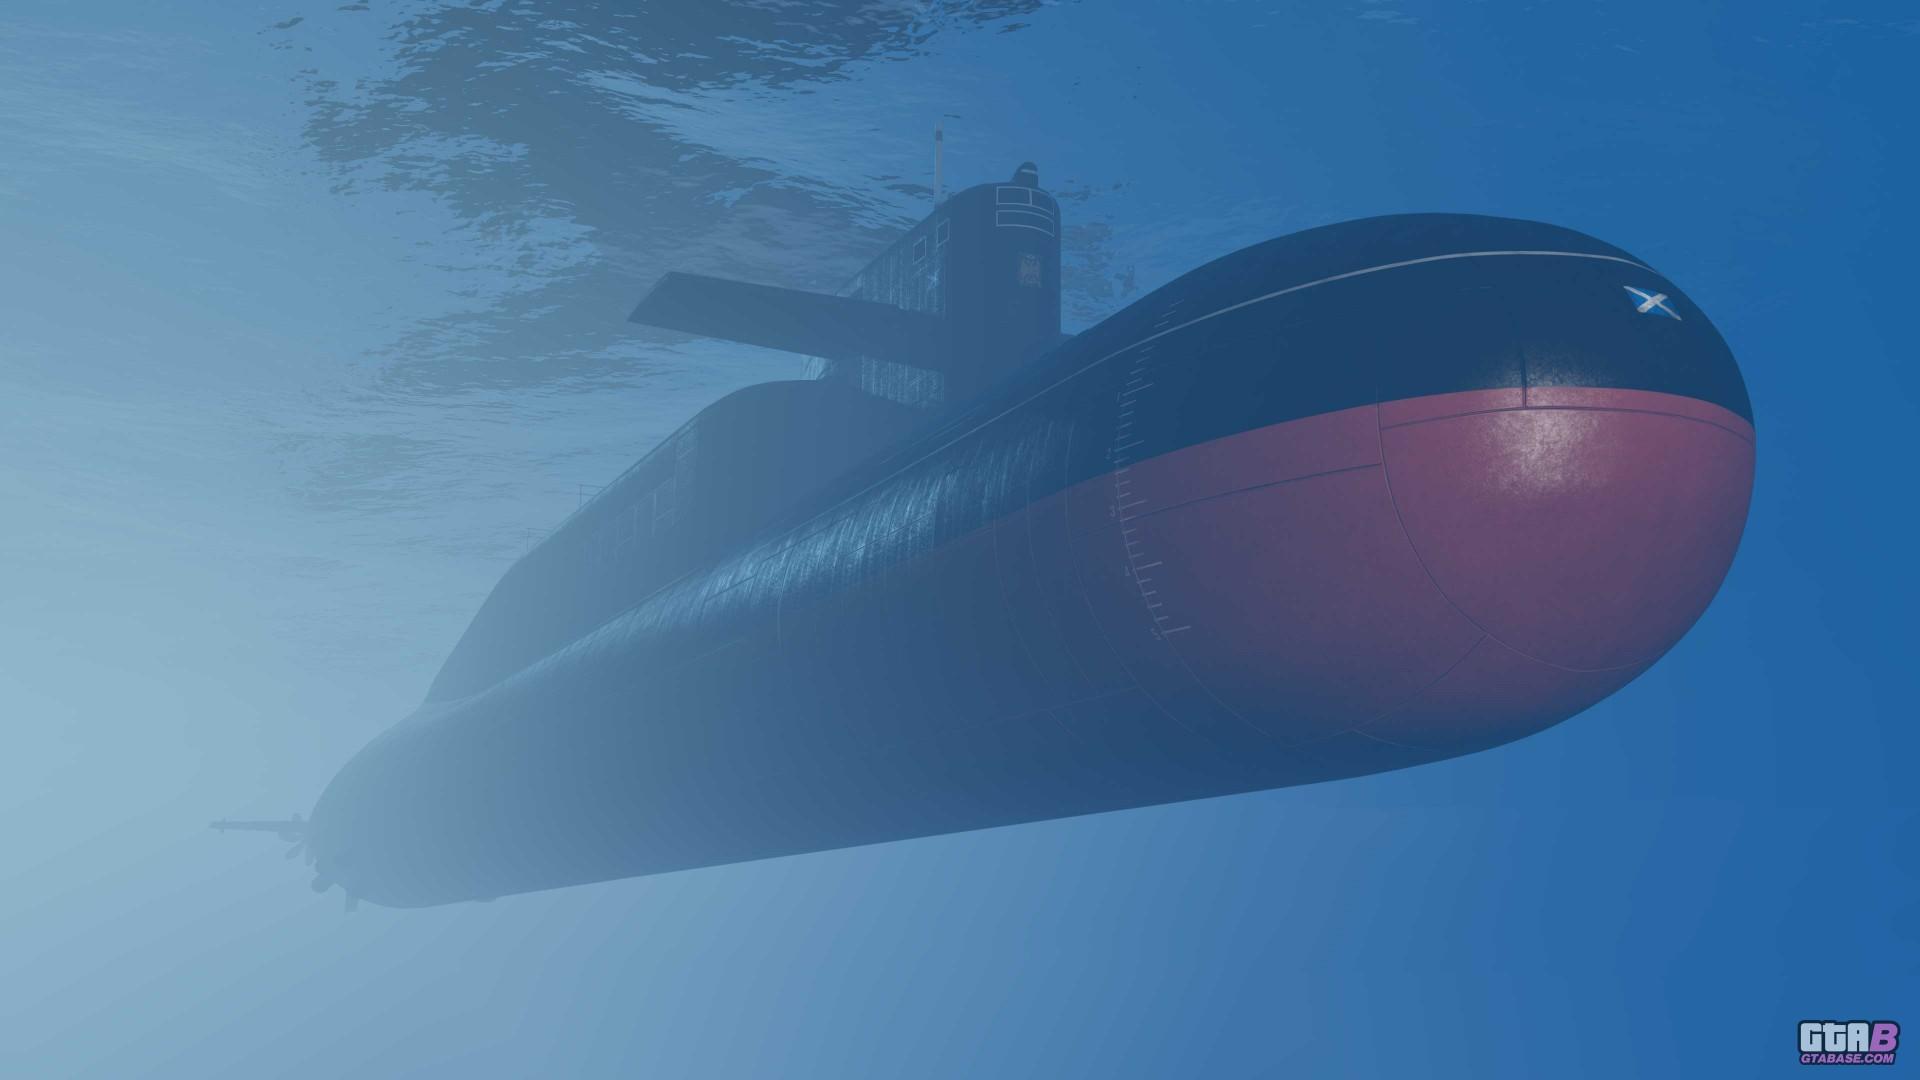 Gta Online Kosatka Submarine Hq Info Price Upgrades Customizations Cayo Perico Heist Update